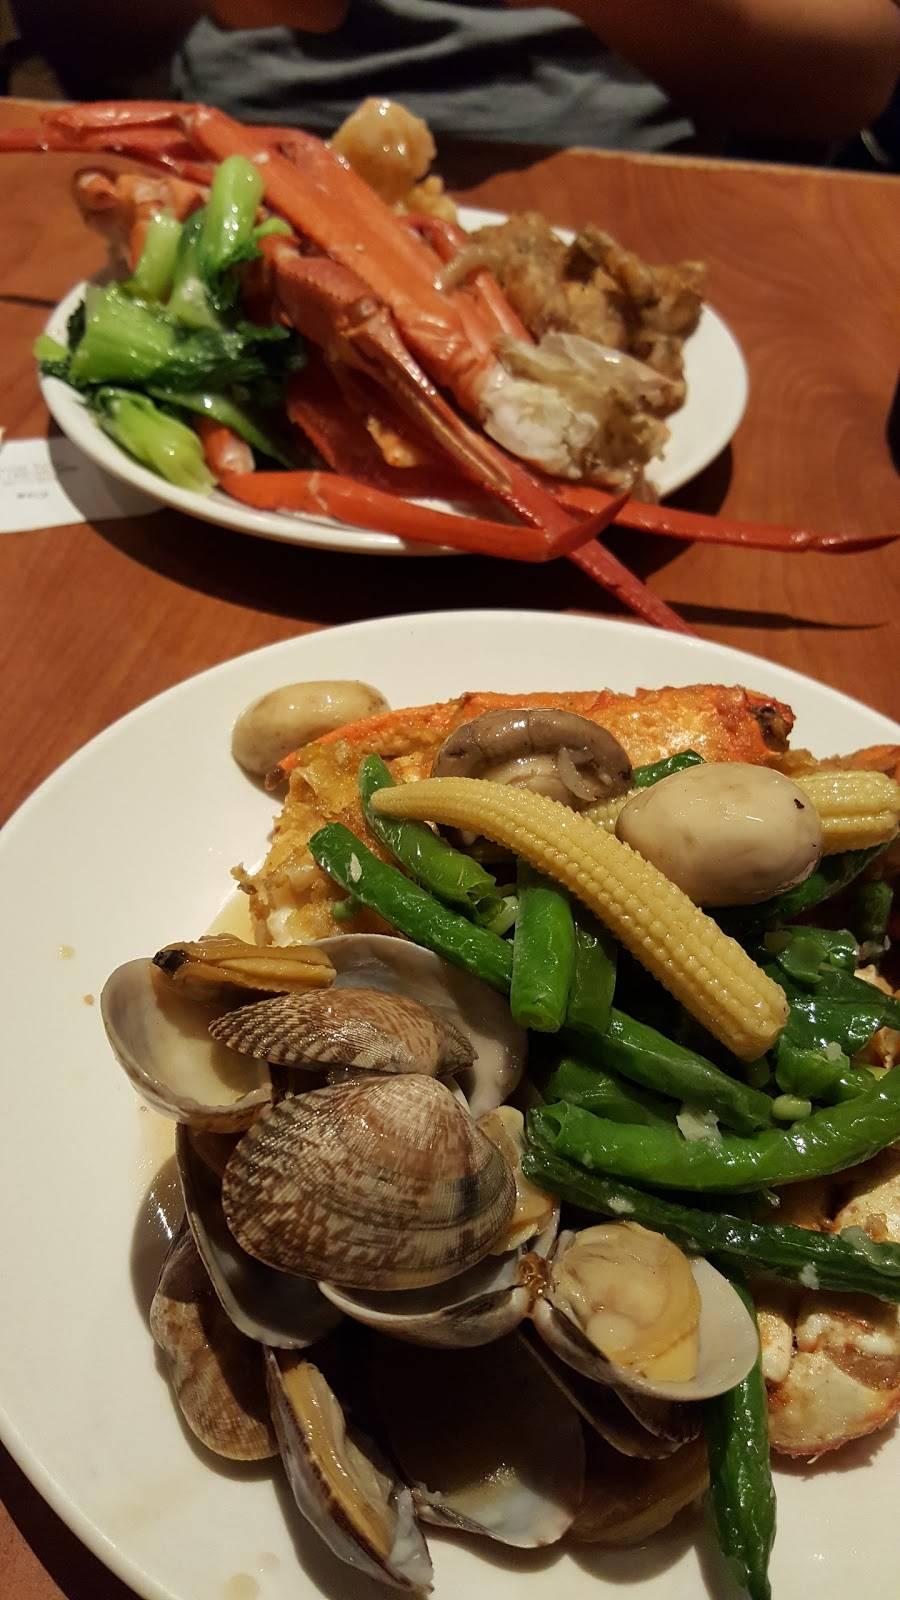 Milpitas Buffet | restaurant | 24 S Abbott Ave, Milpitas, CA 95035, USA | 4089458888 OR +1 408-945-8888